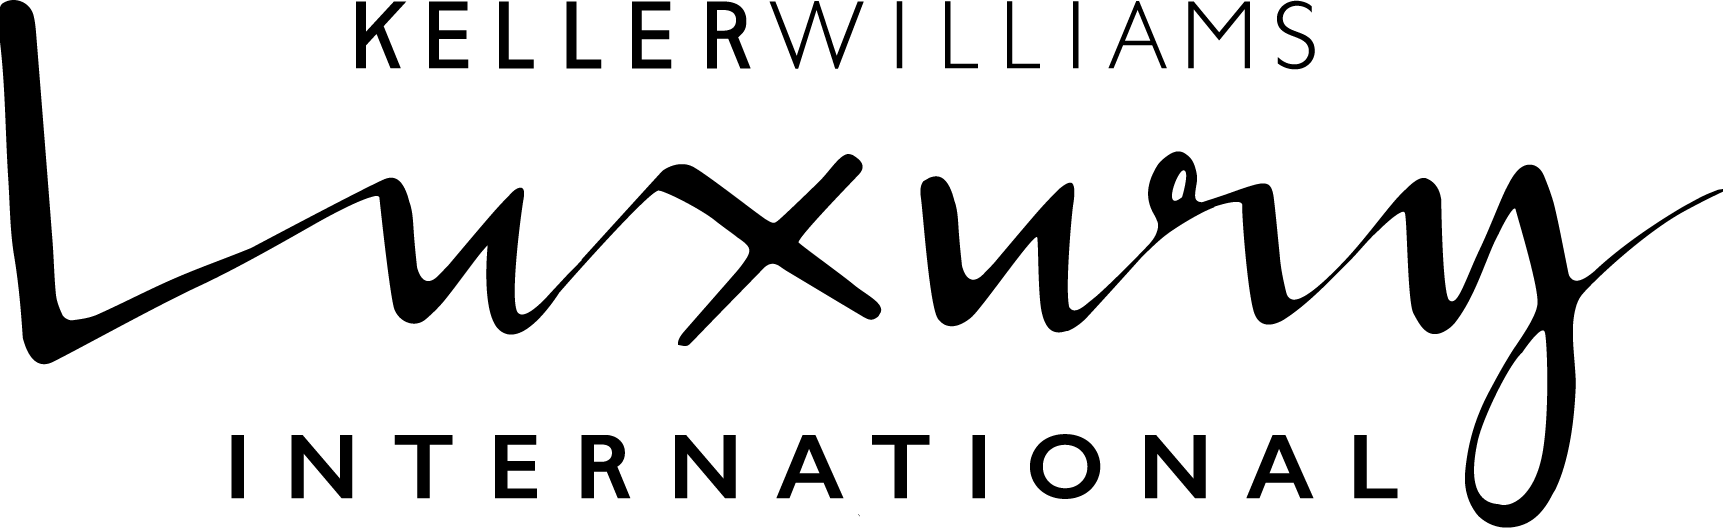 The Indigo Skye GroupCOMPASS